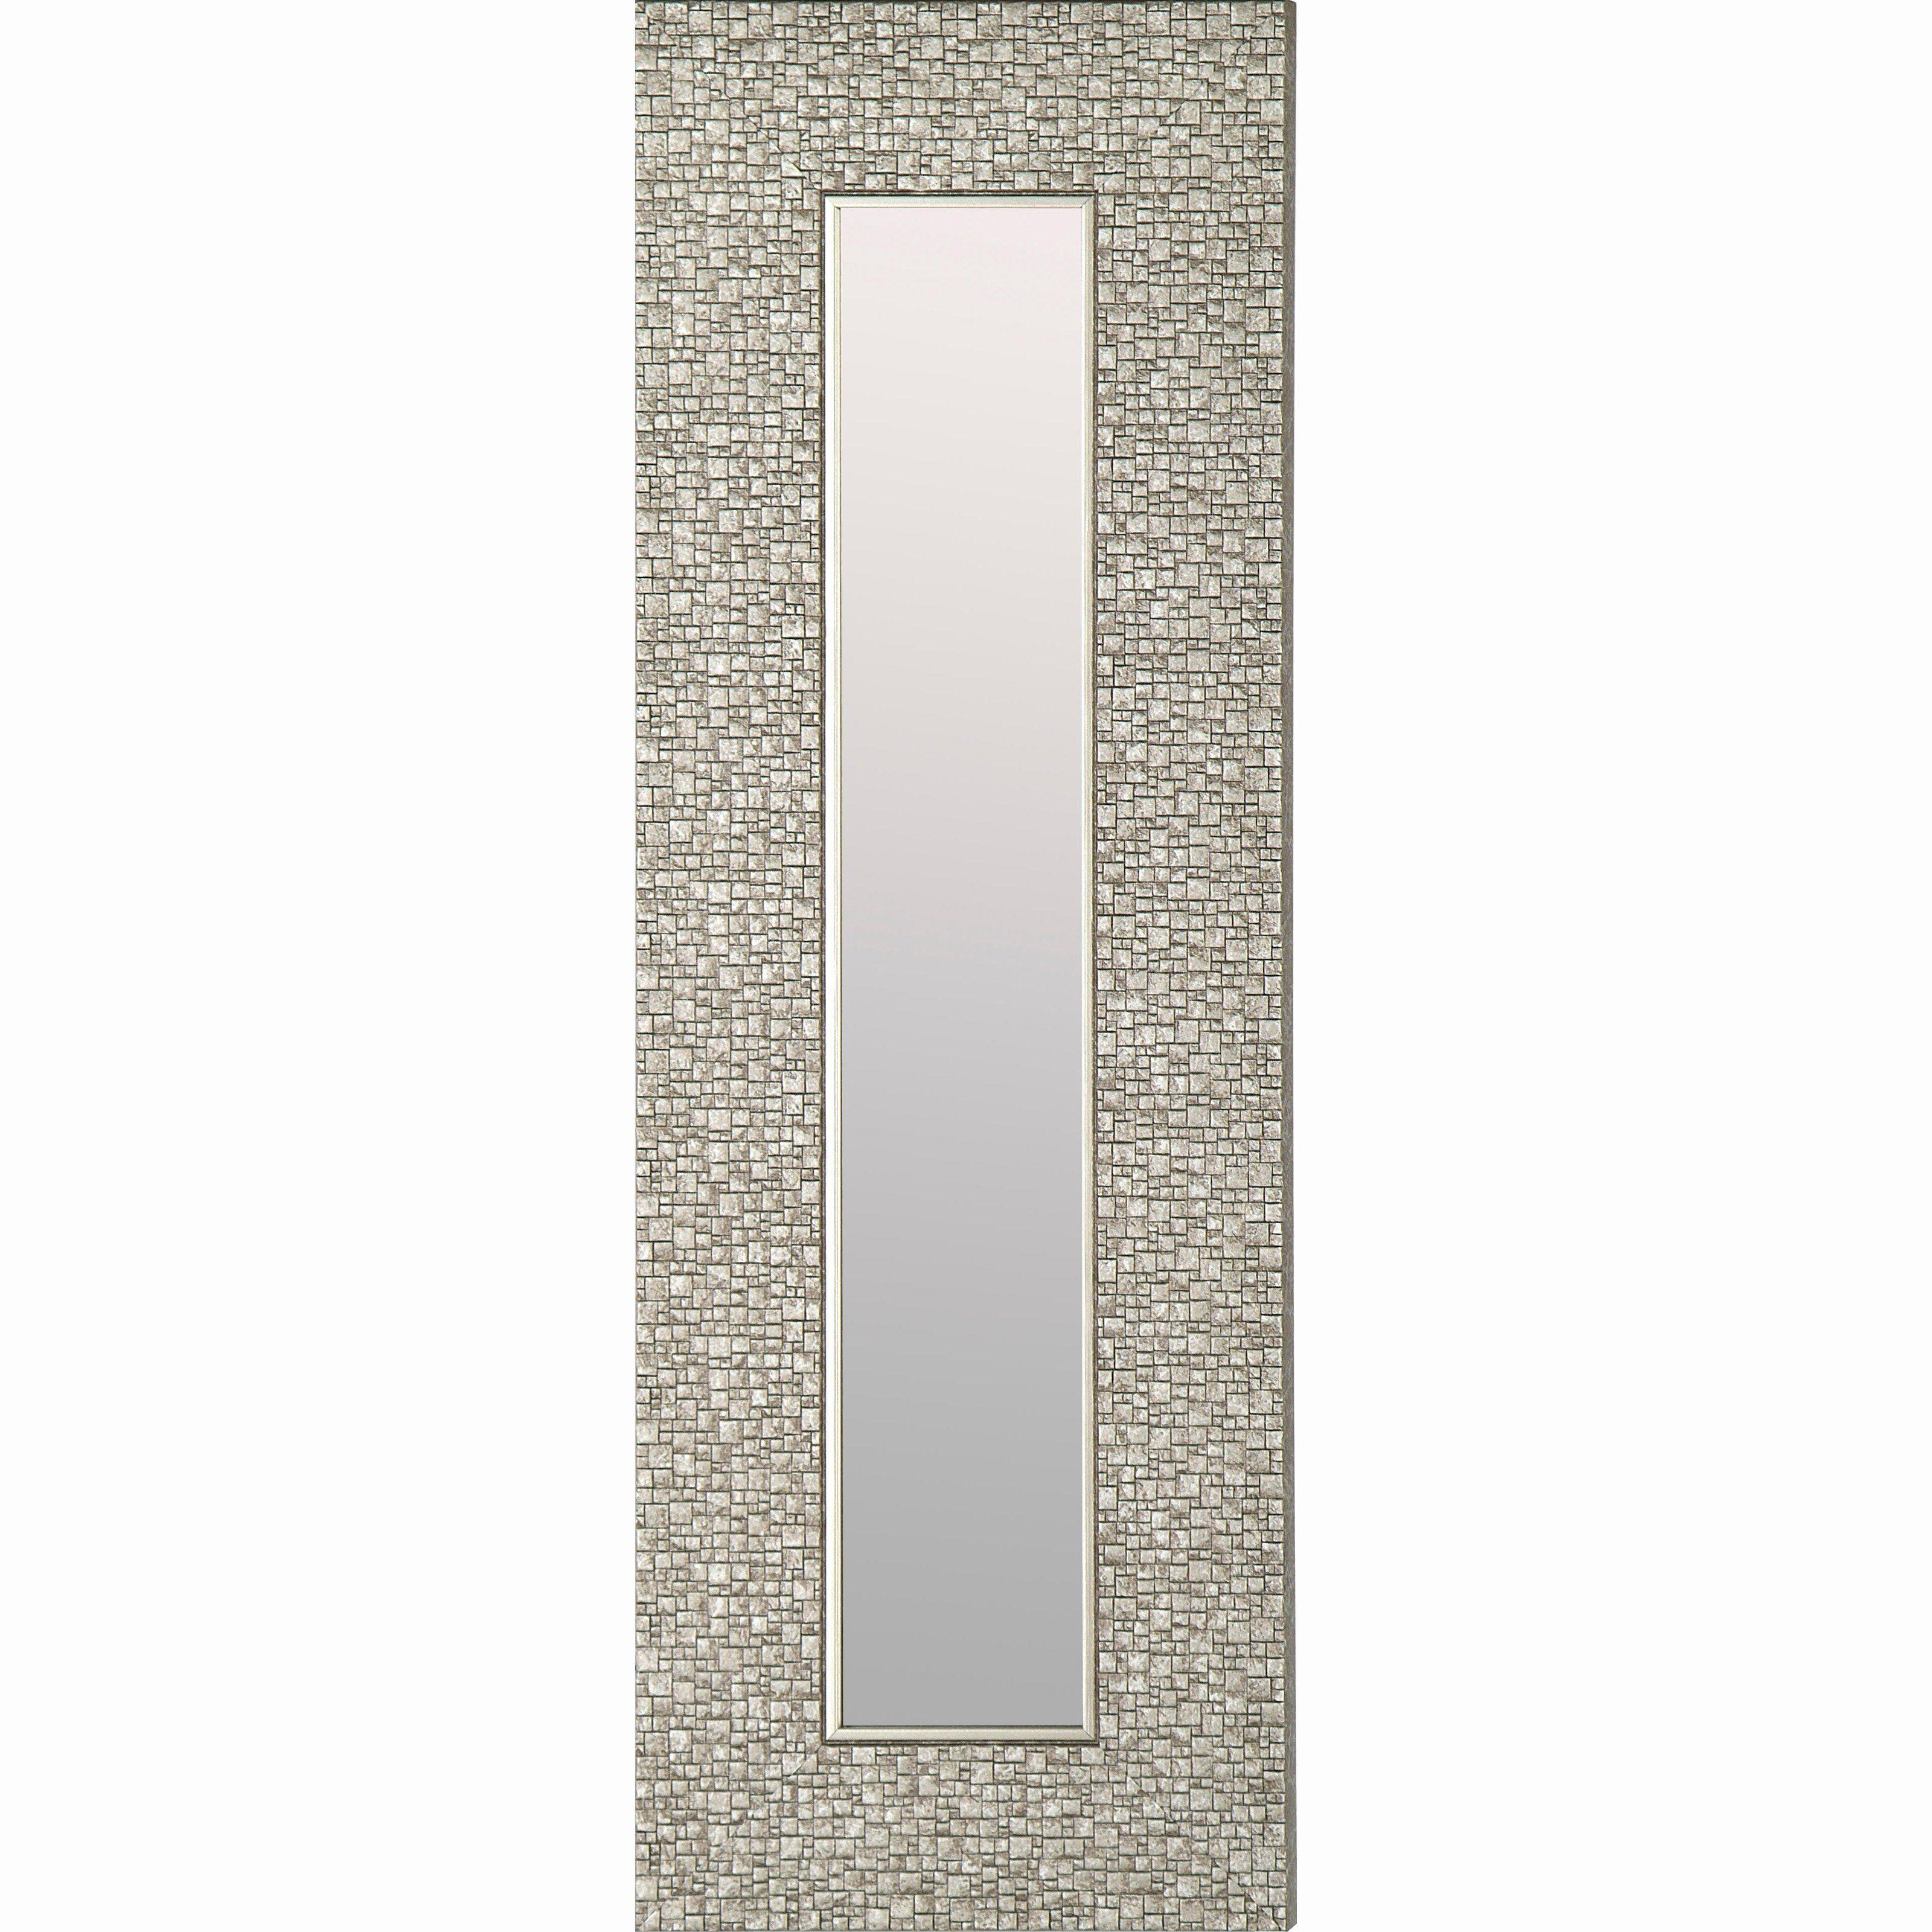 Mirrorize Canada Designer Narrow Wall Mirror Set Of 3 Modern